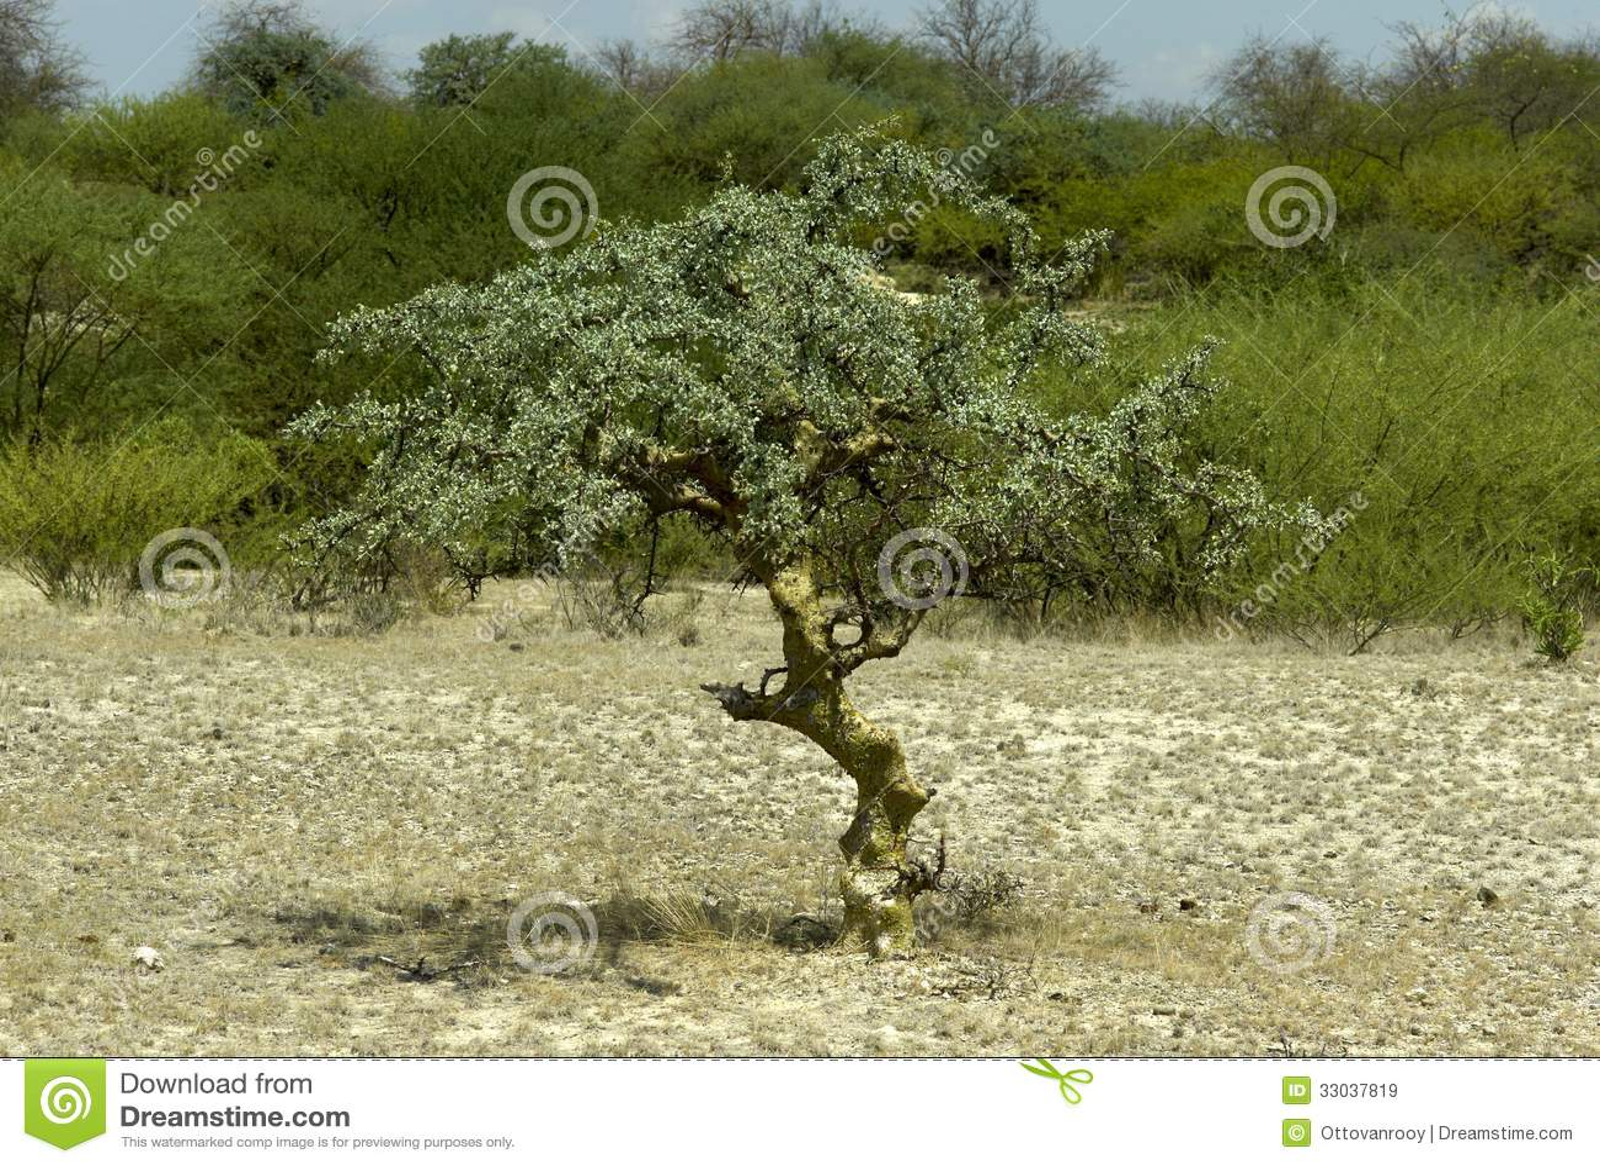 free familiy tree